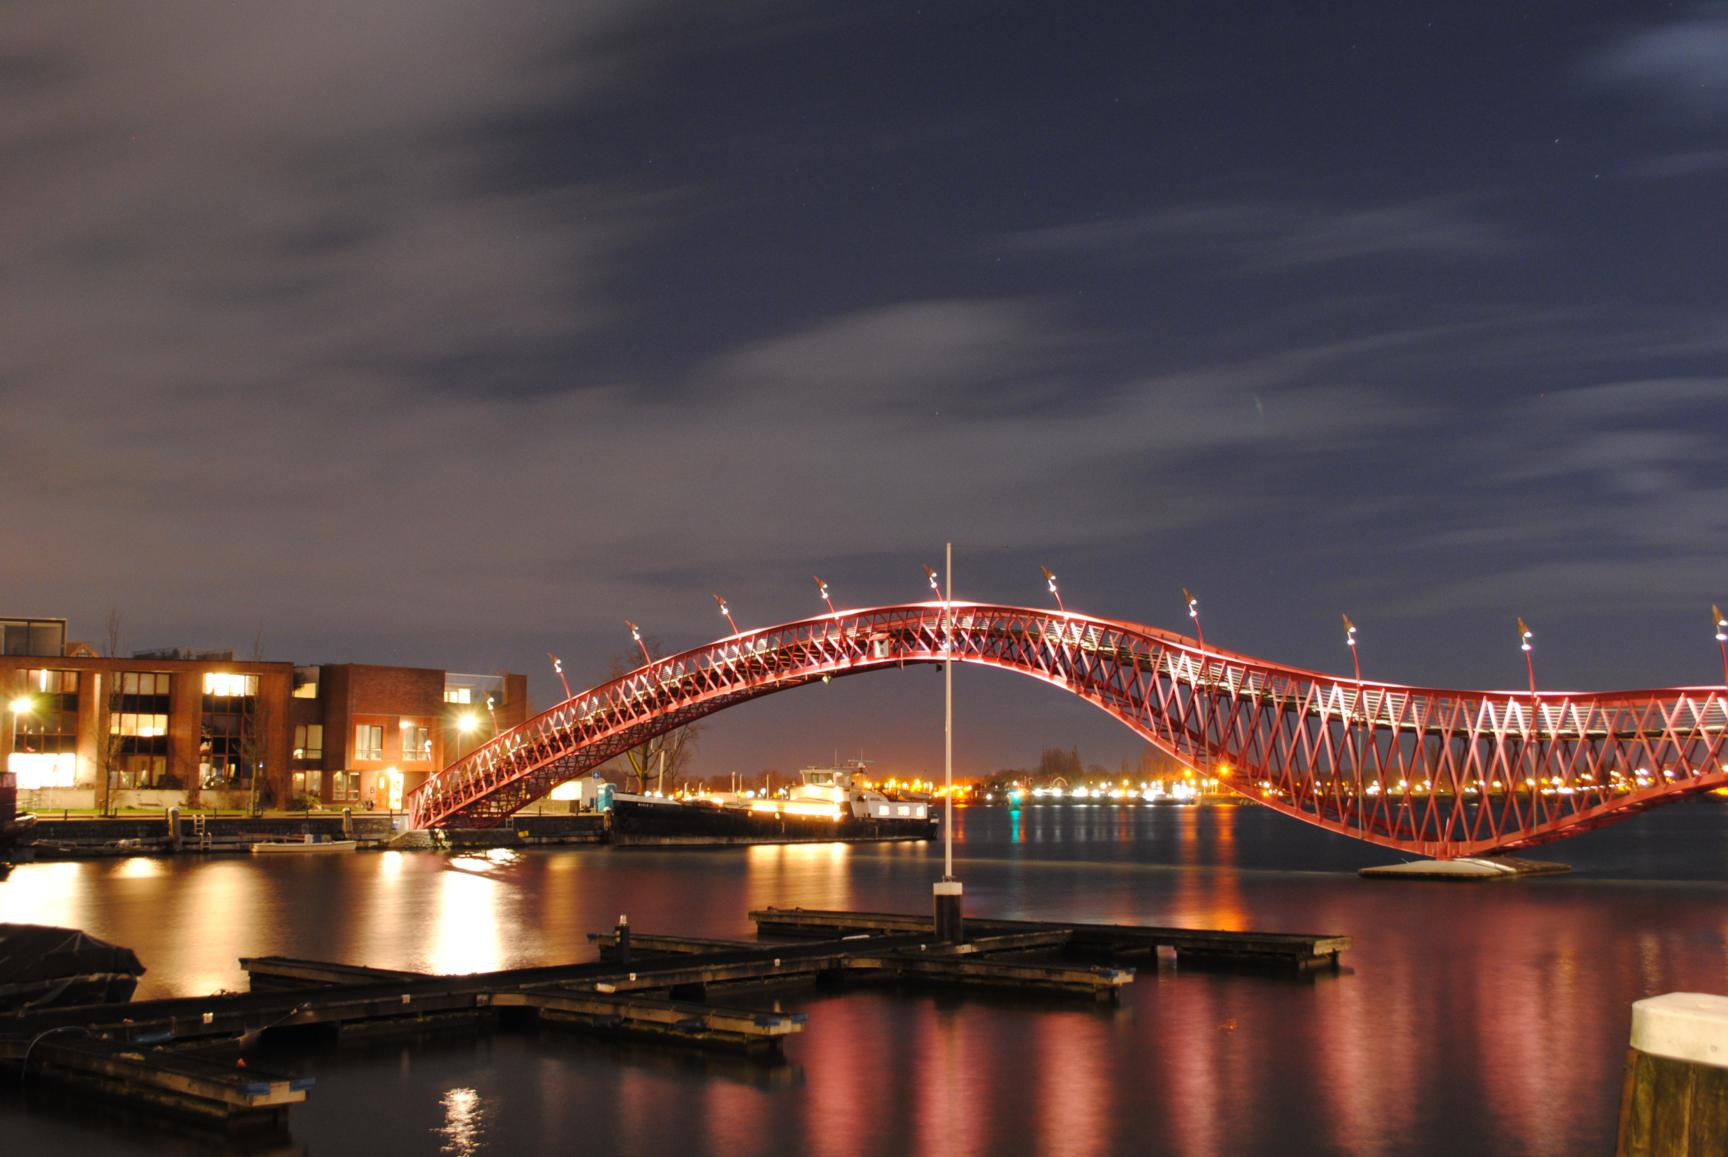 Phyton Bridge,  barrio de Borneo. Amsterdam 2015.